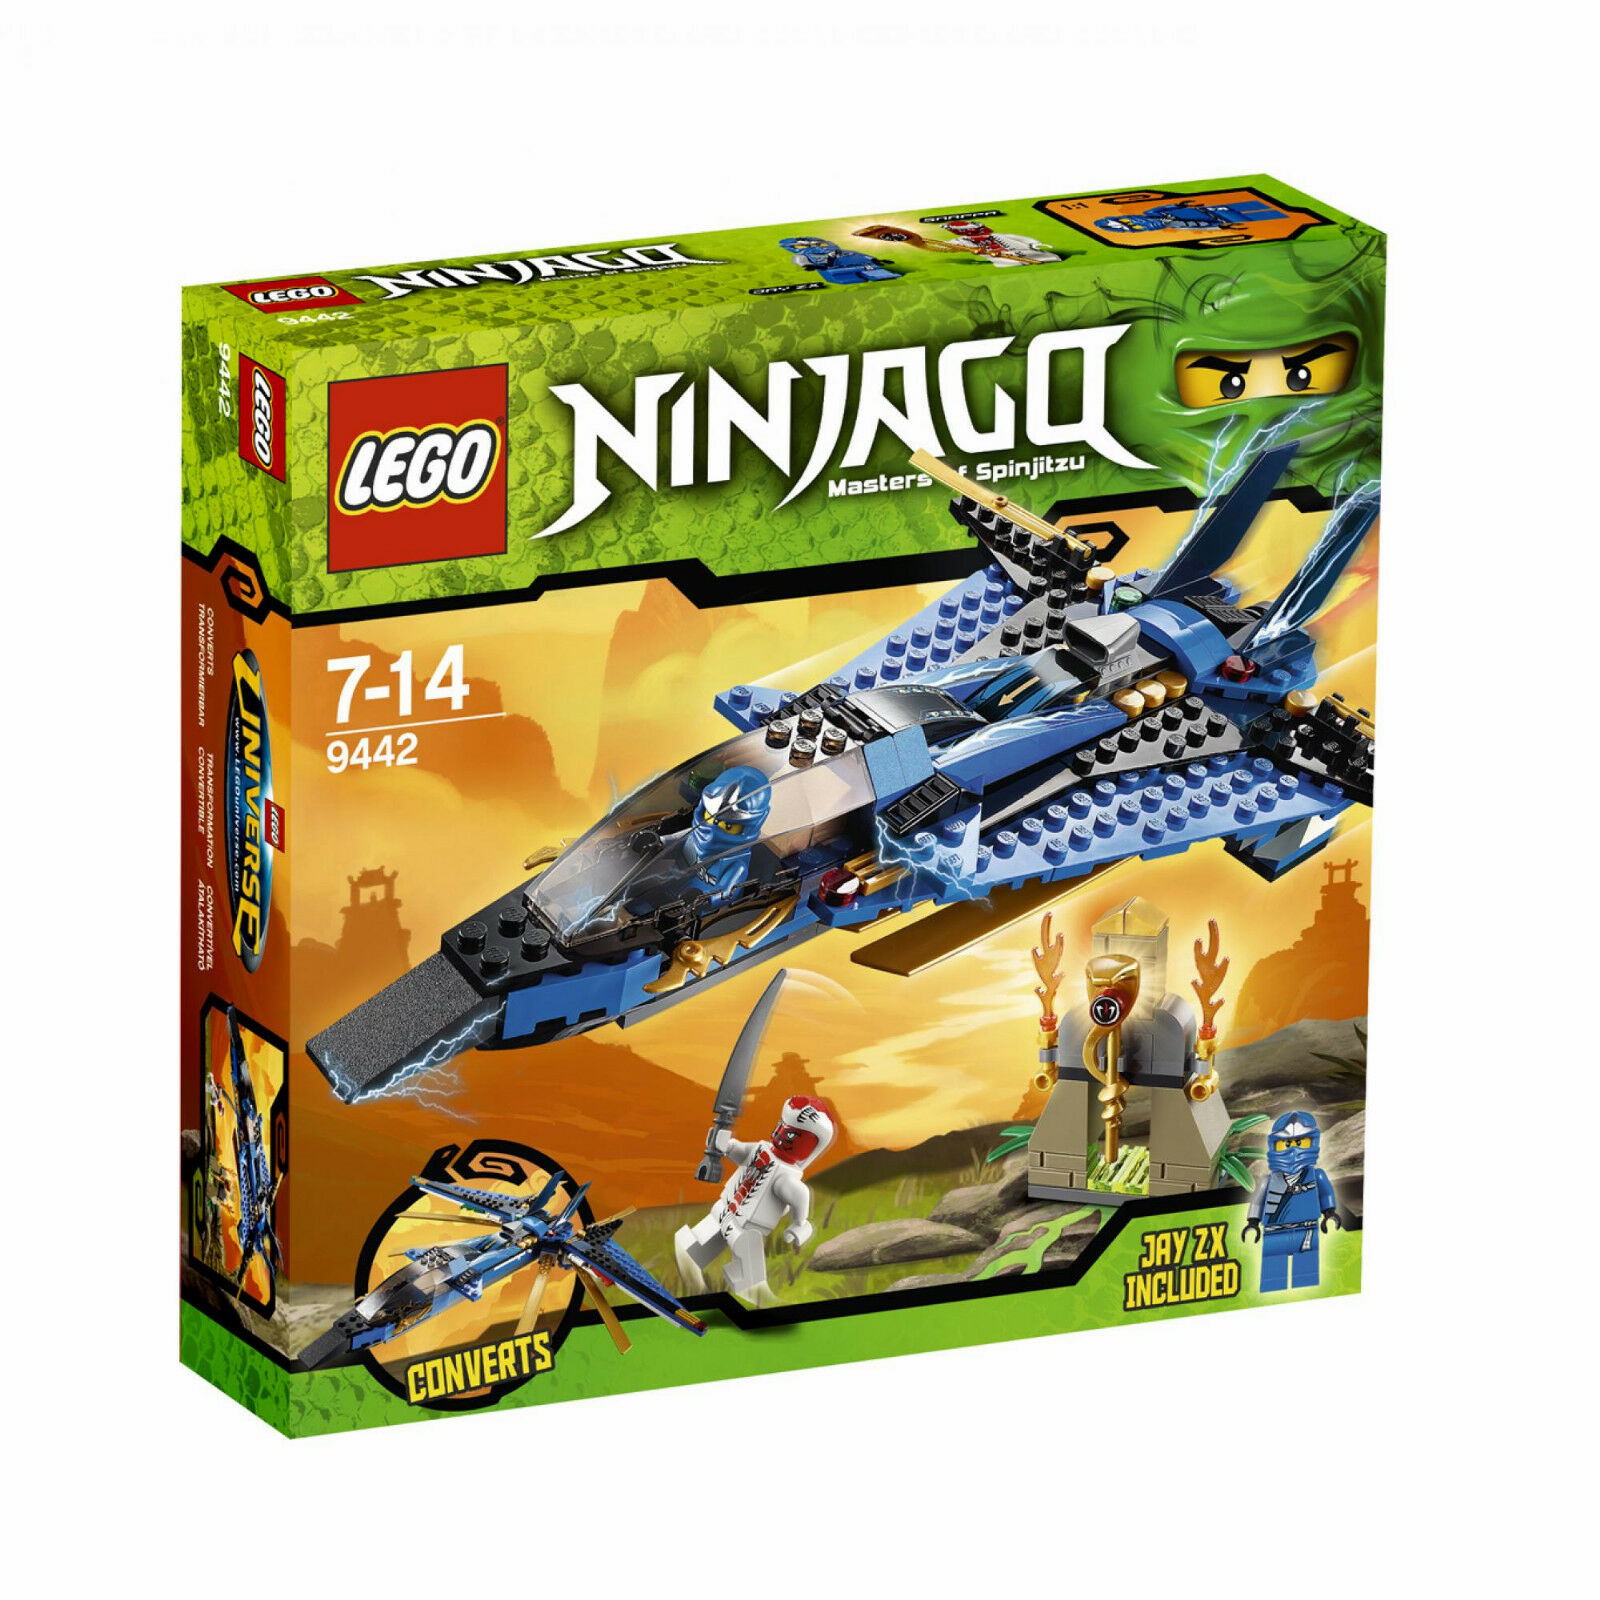 LEGO Ninjago Jay s Storm Fighter inklusive Jay ZX - samlaor s 2011 släpp Herregud